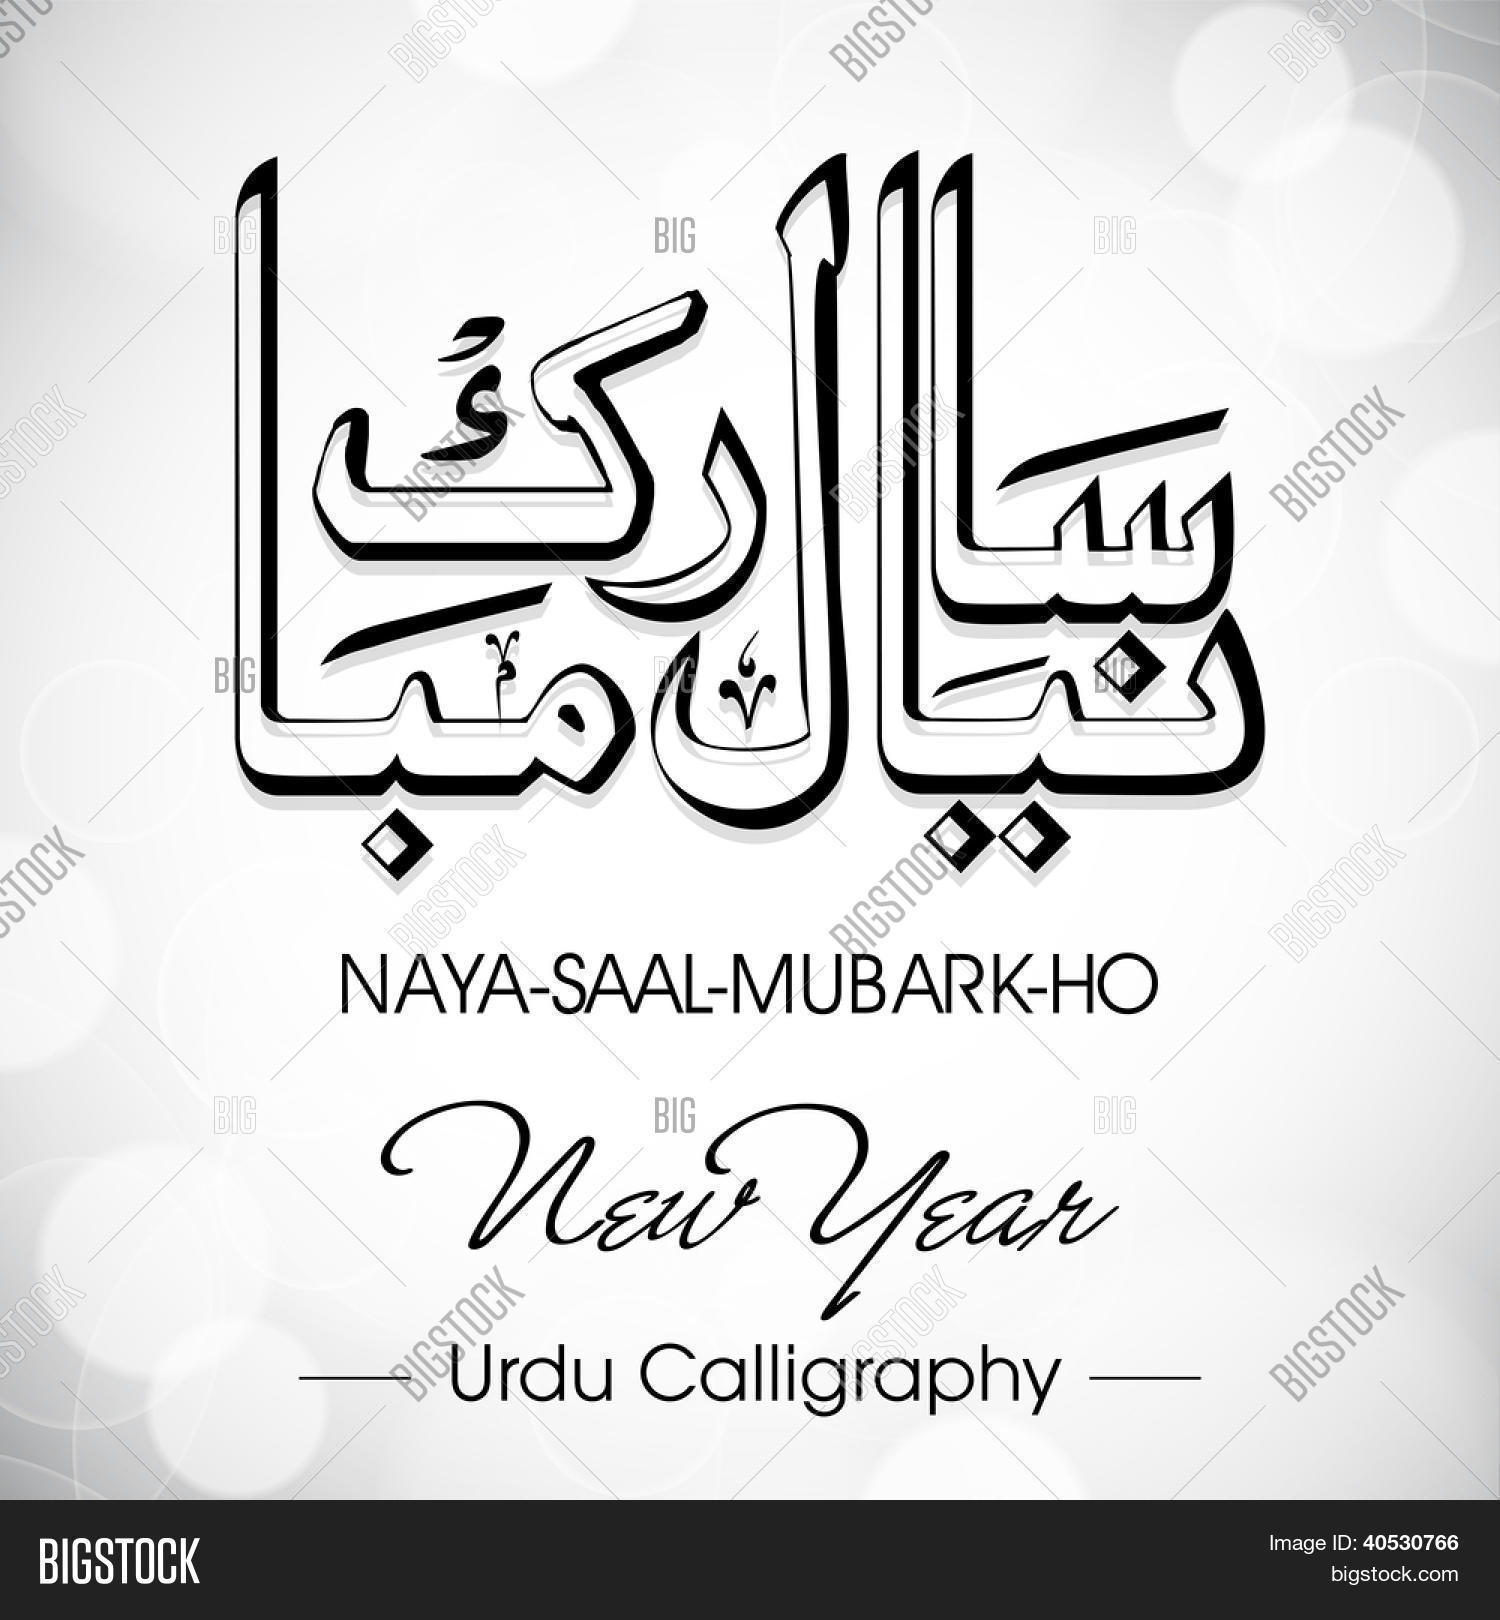 Urdu Calligraphy Naya Saal Mubarak Vector Photo Bigstock